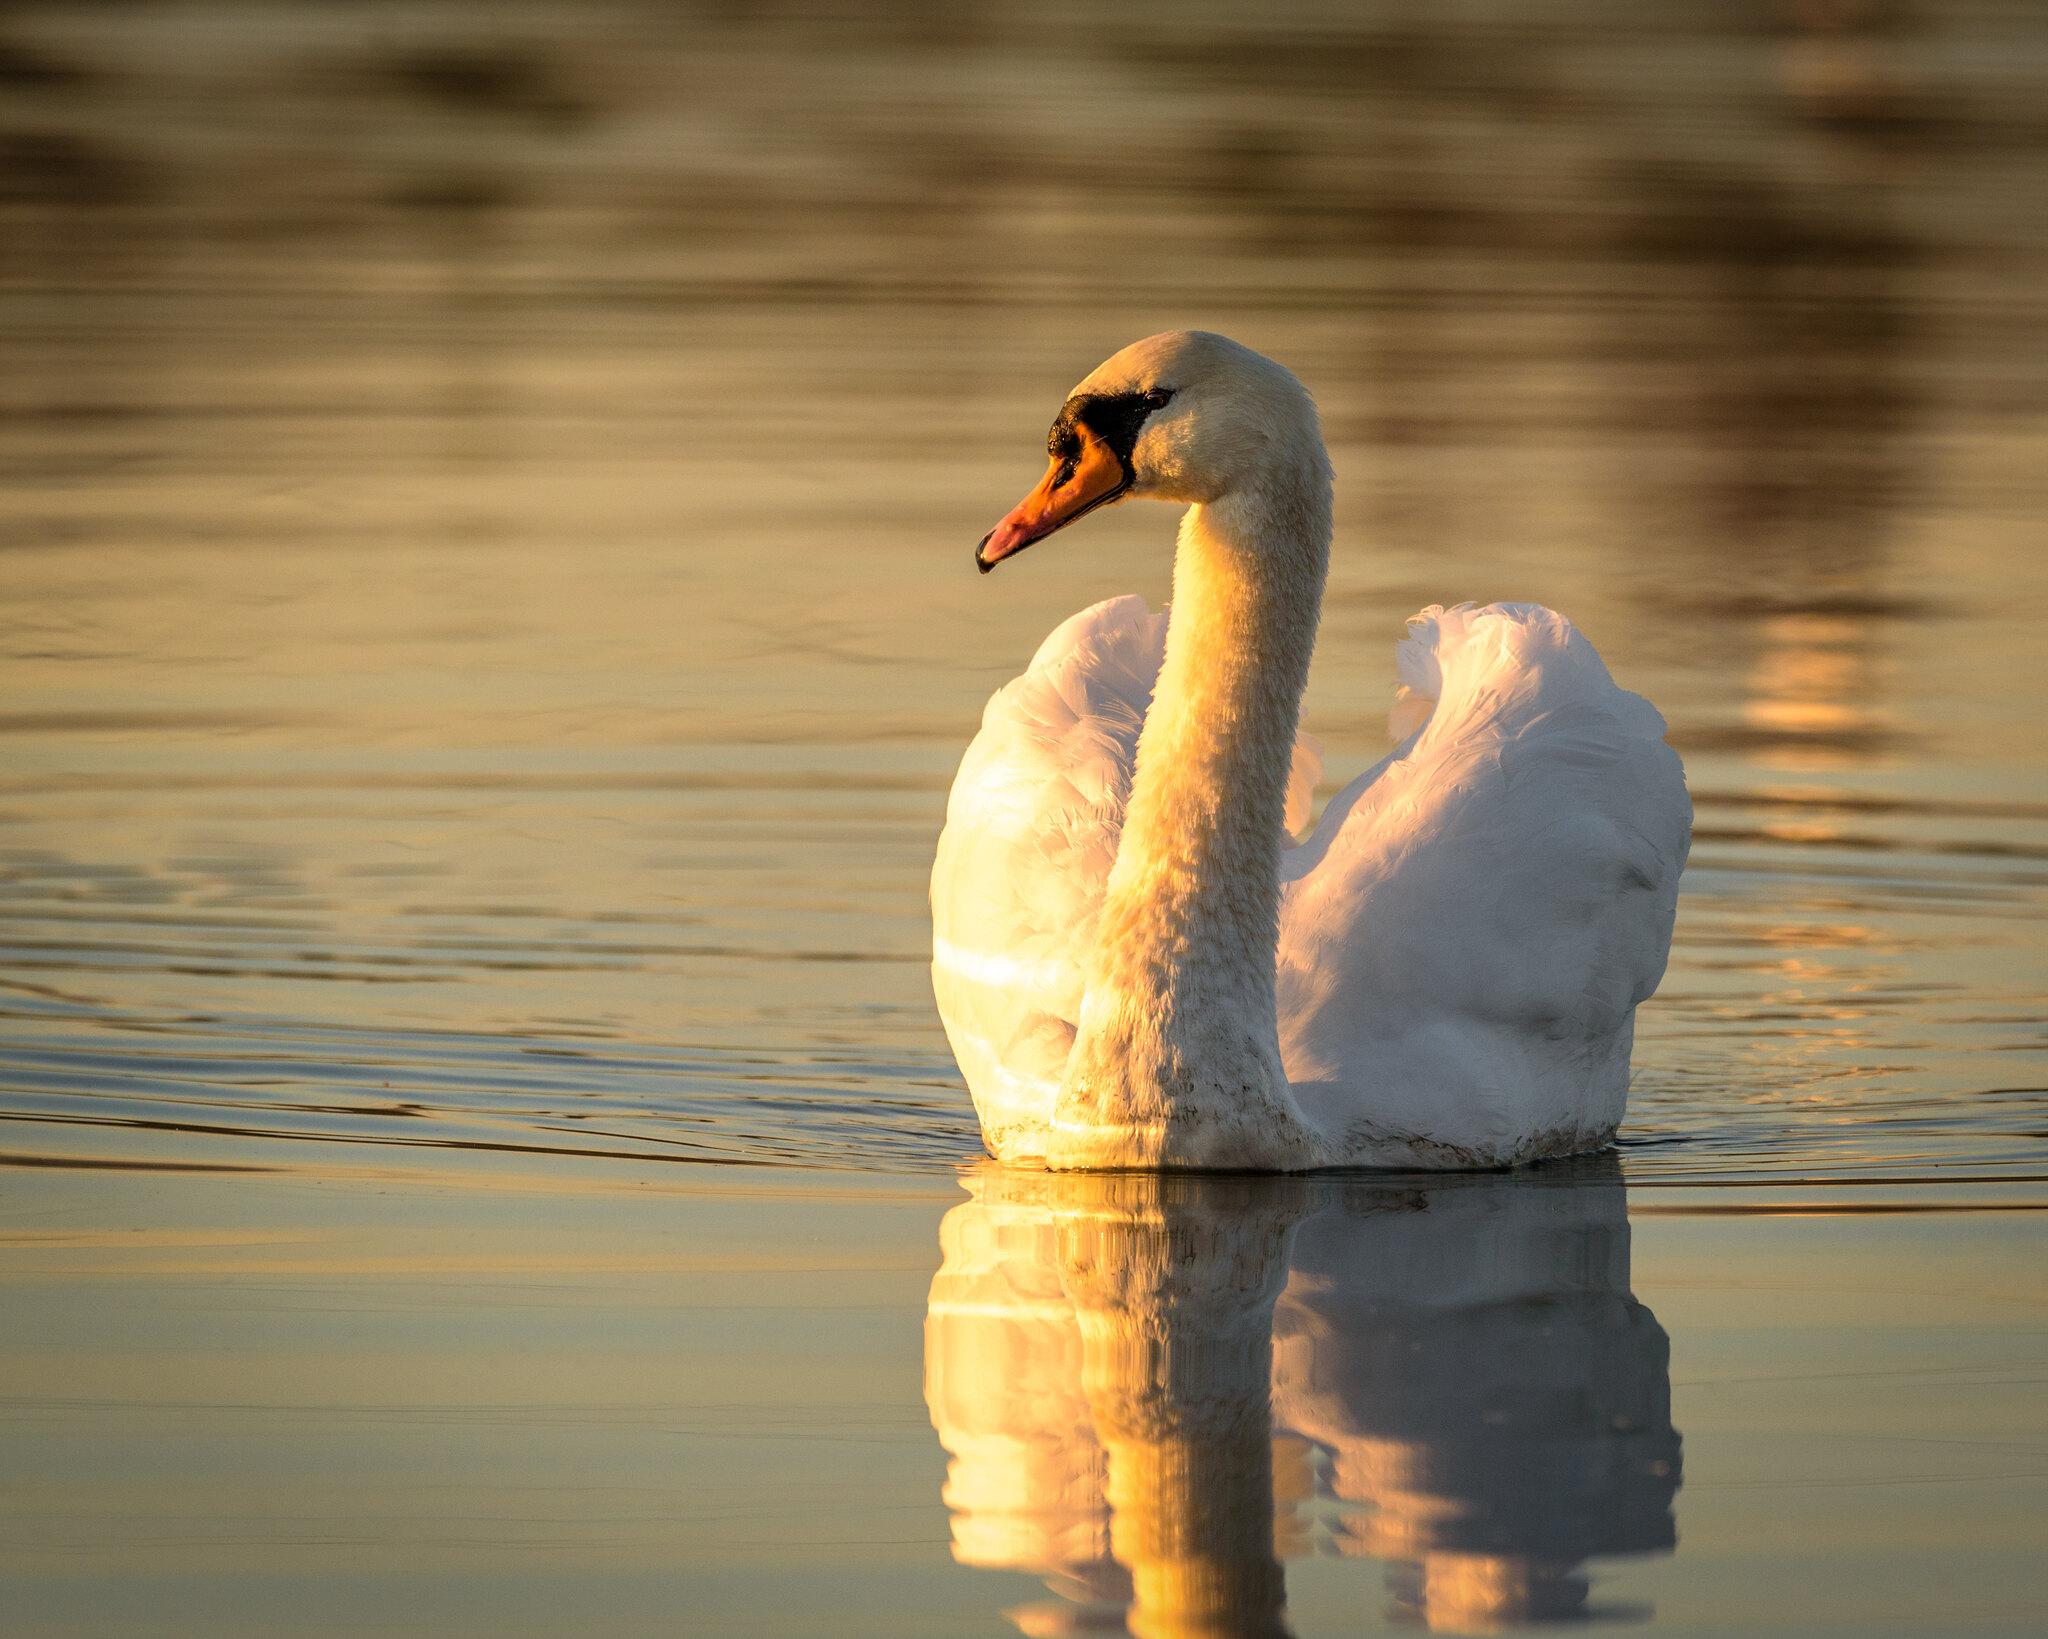 Mute Swan at Sunrise in the pond near Kroger in Bellbrook.